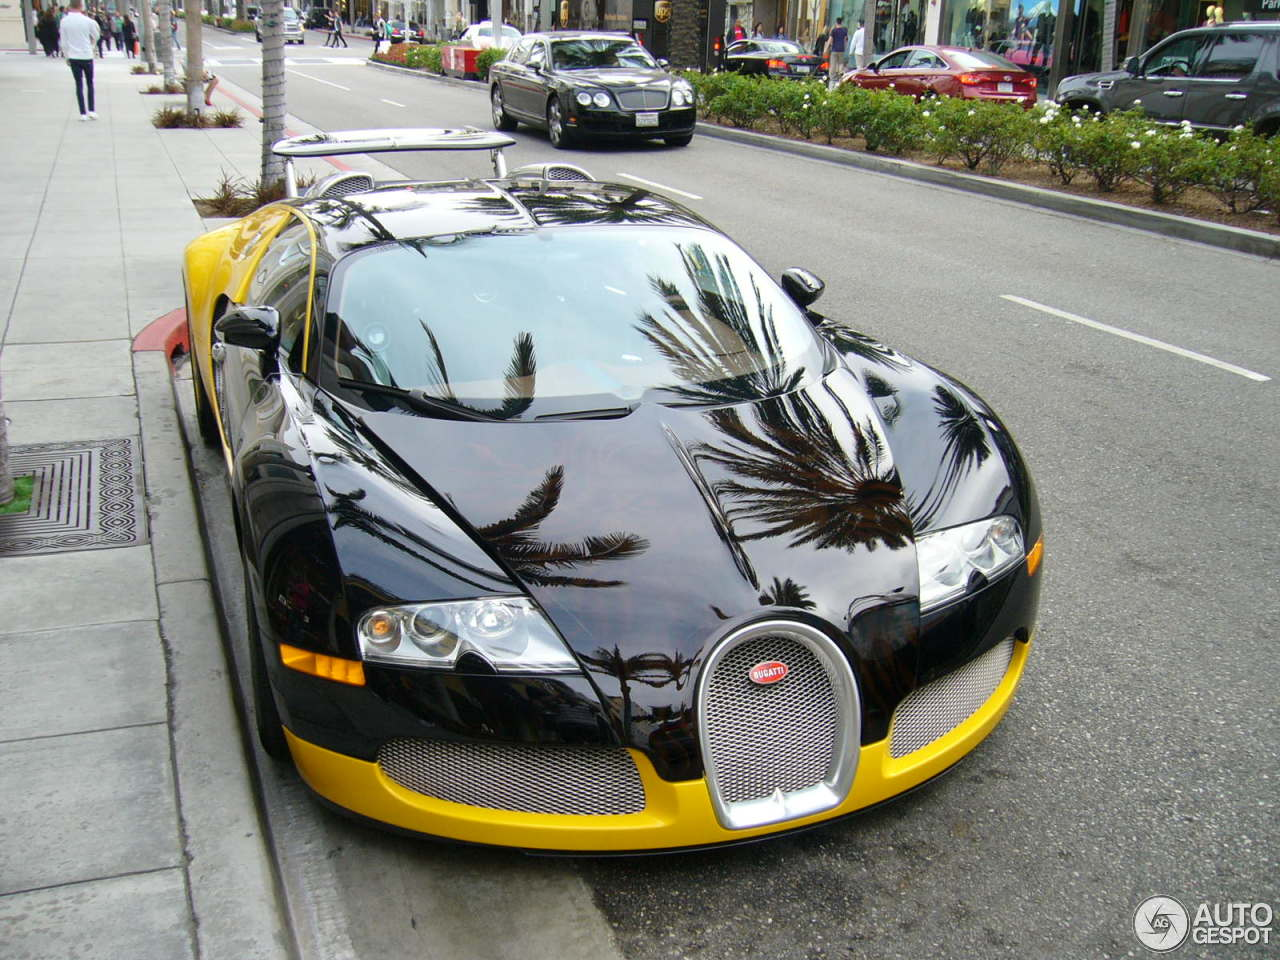 bugatti veyron price in usa 2014 2014 bugatti veyron hyper sport price top auto magazine 2014. Black Bedroom Furniture Sets. Home Design Ideas